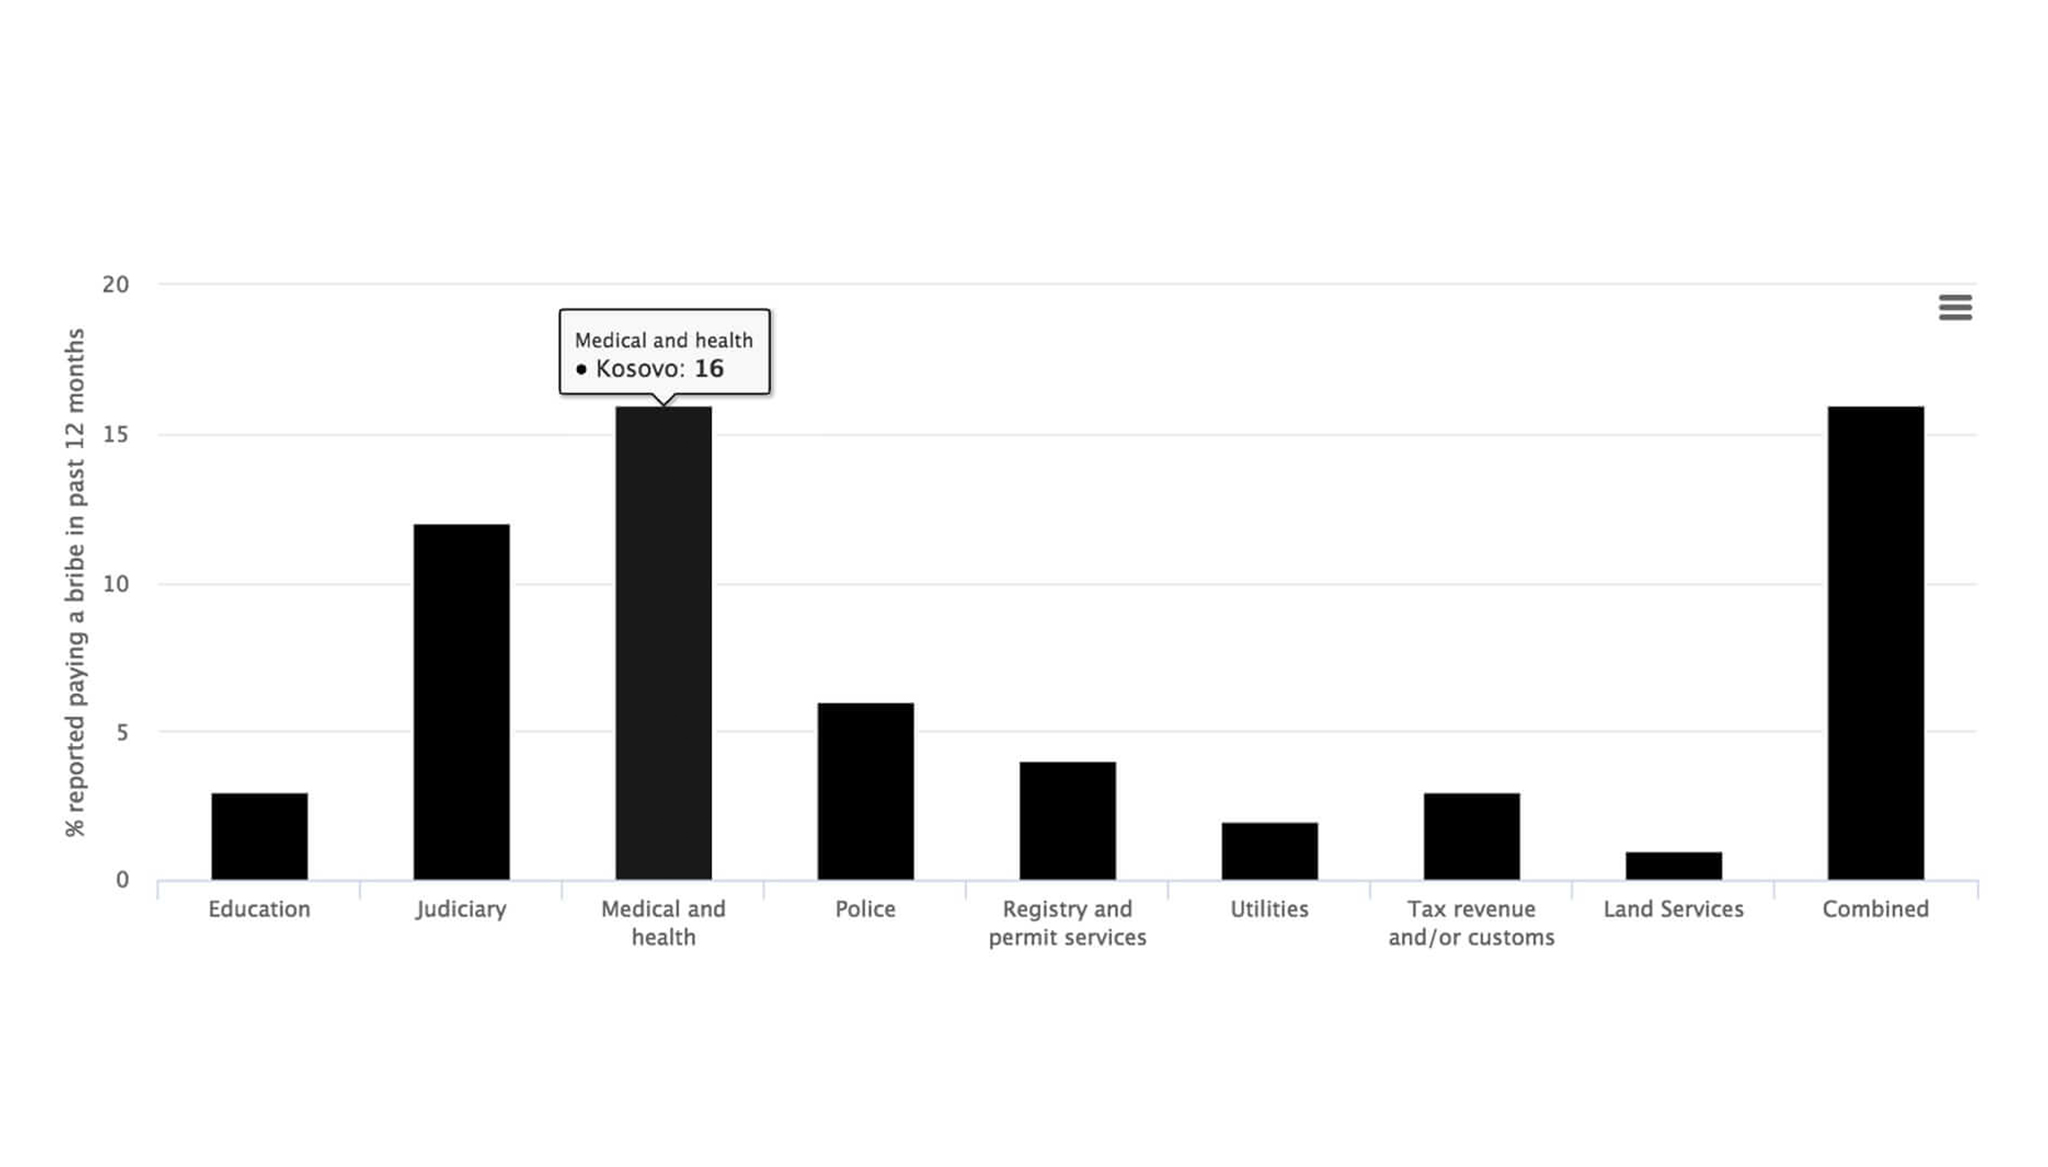 Corruption in Kosovo: A Comparative Analysis